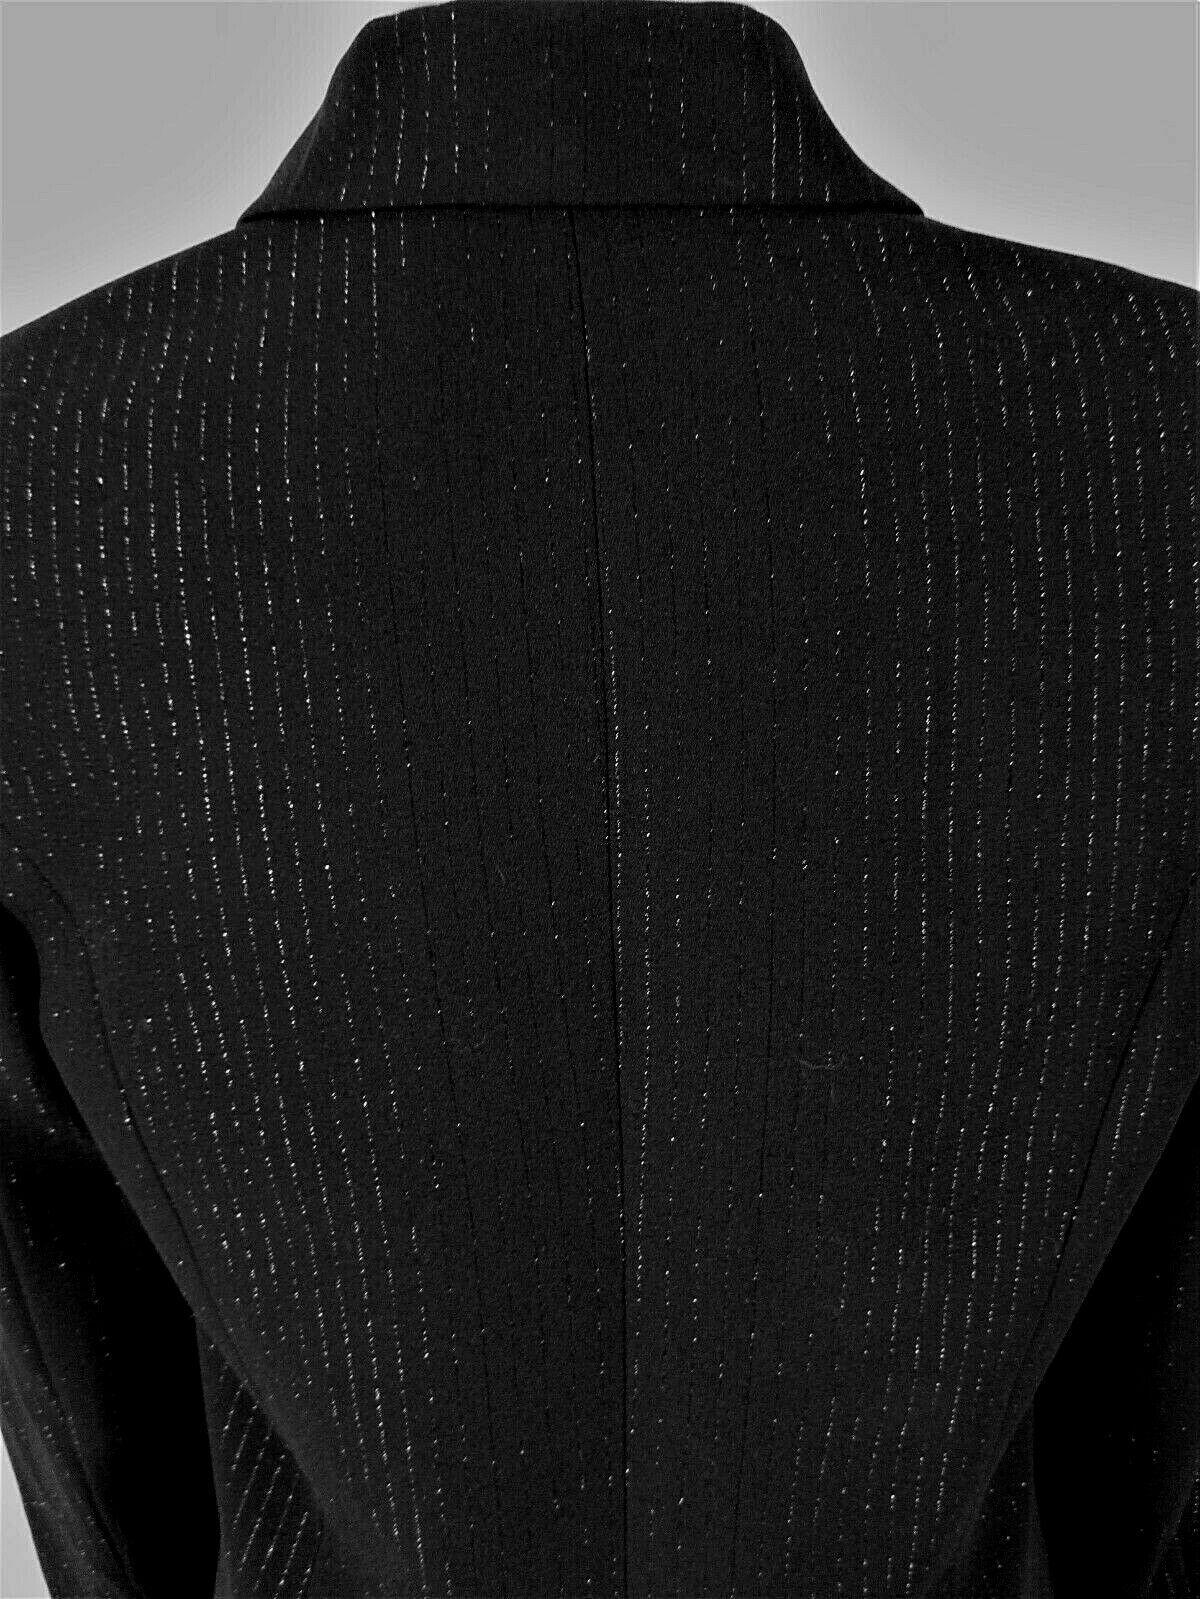 ANNA CAROLE womens Sz 8 L/S black silver THREADS button down LINED jacket (B4)